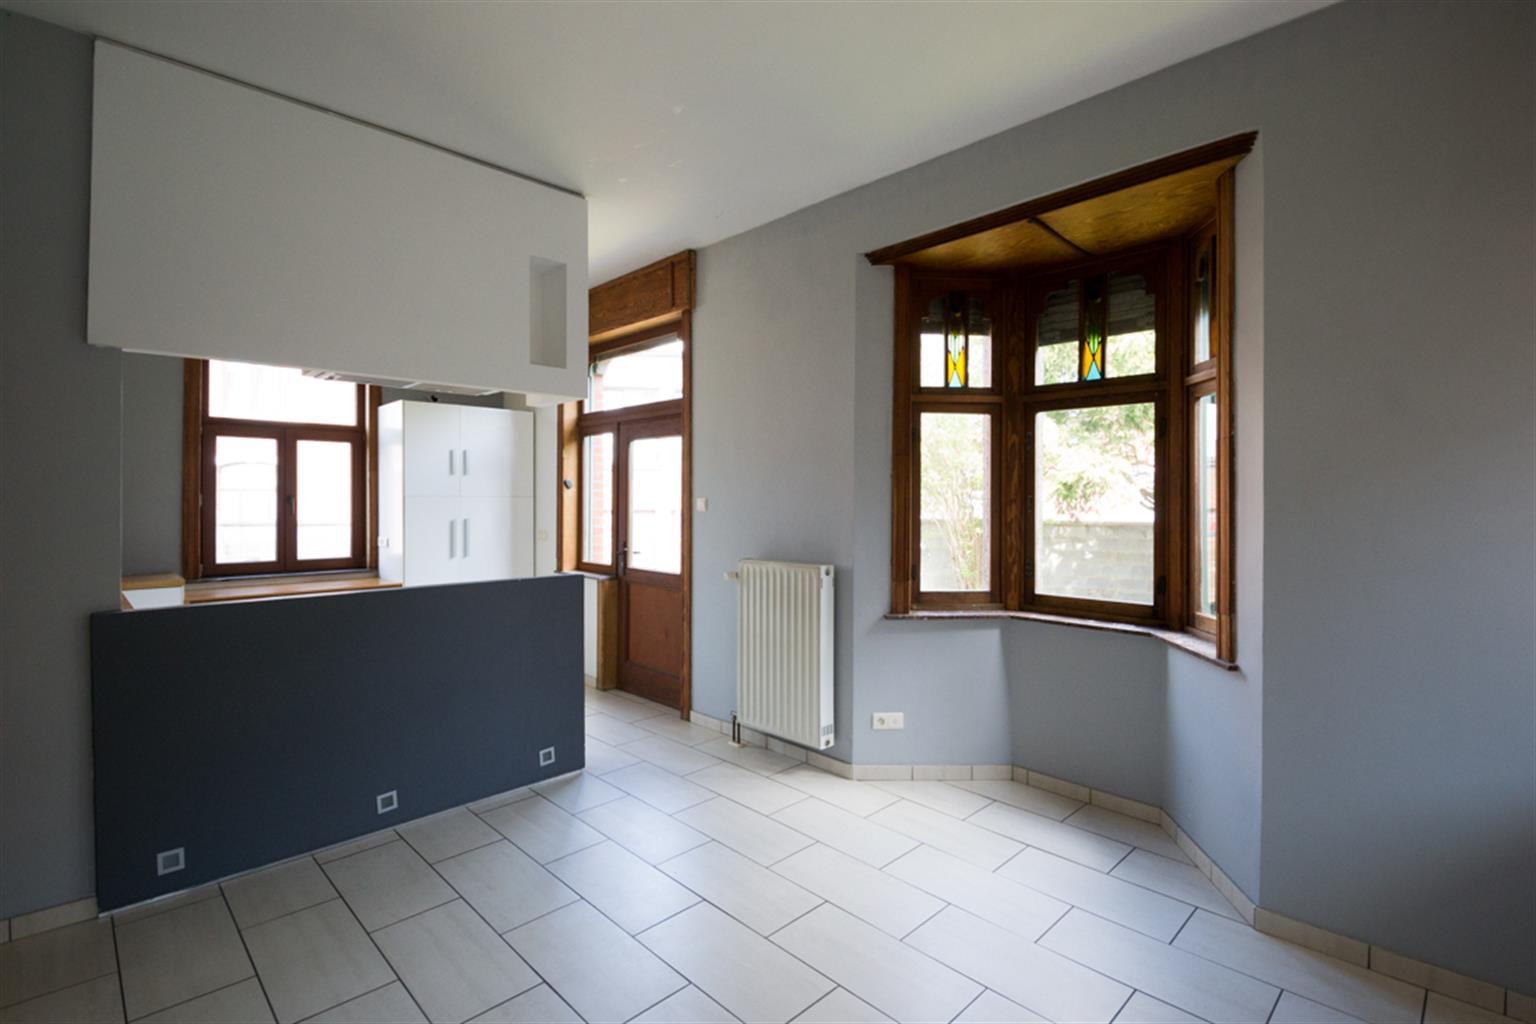 Maison - Seneffe - #4343282-7